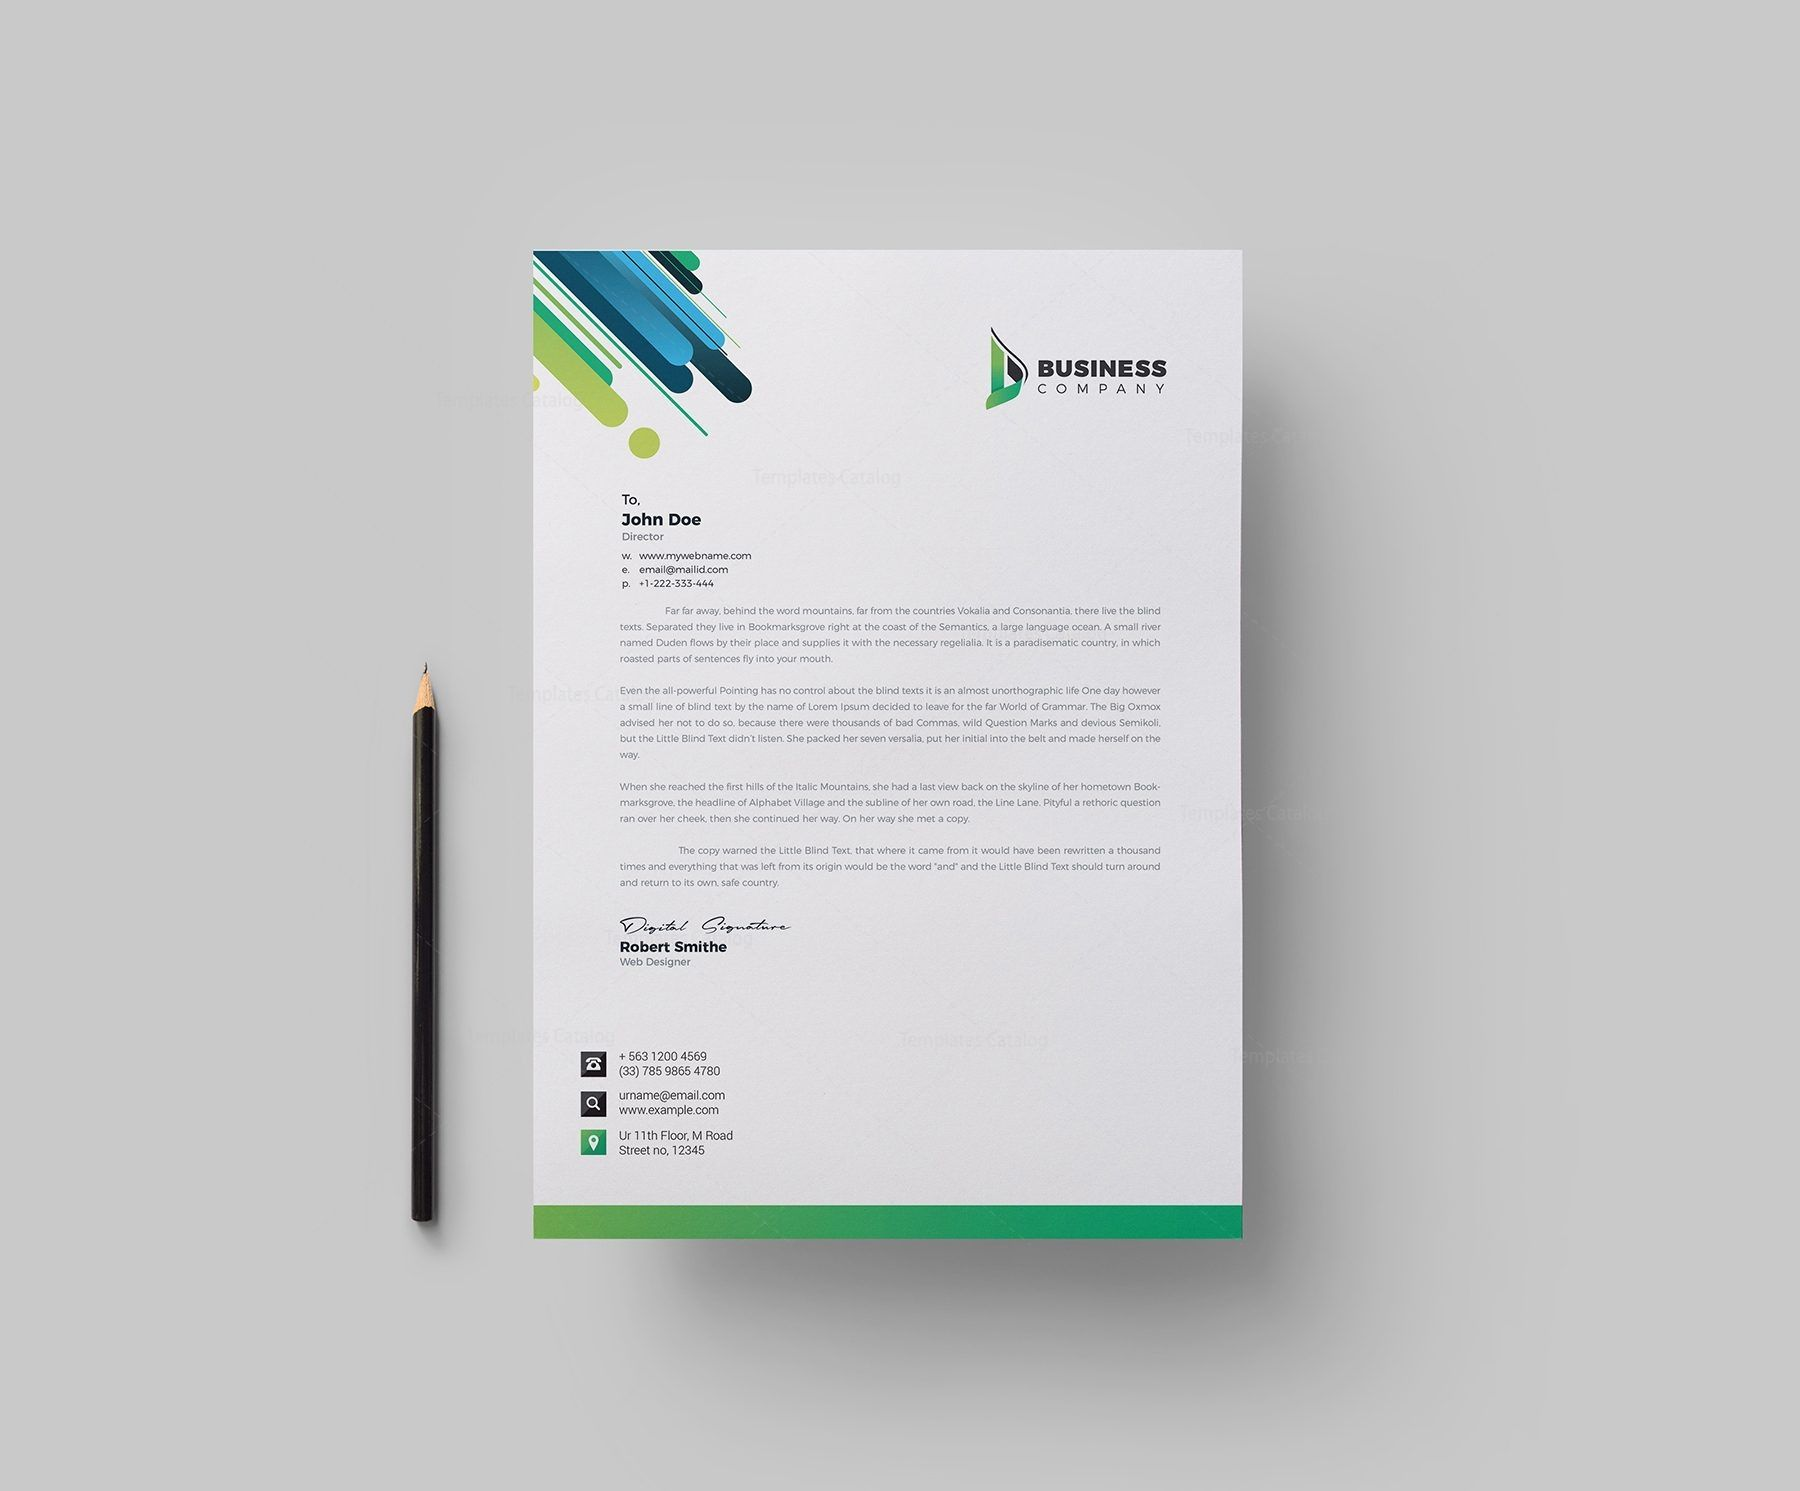 Best Corporate Identity Pack Design Template 002120 Template Catalog Letterhead Design Letterhead Template Company Letterhead Template